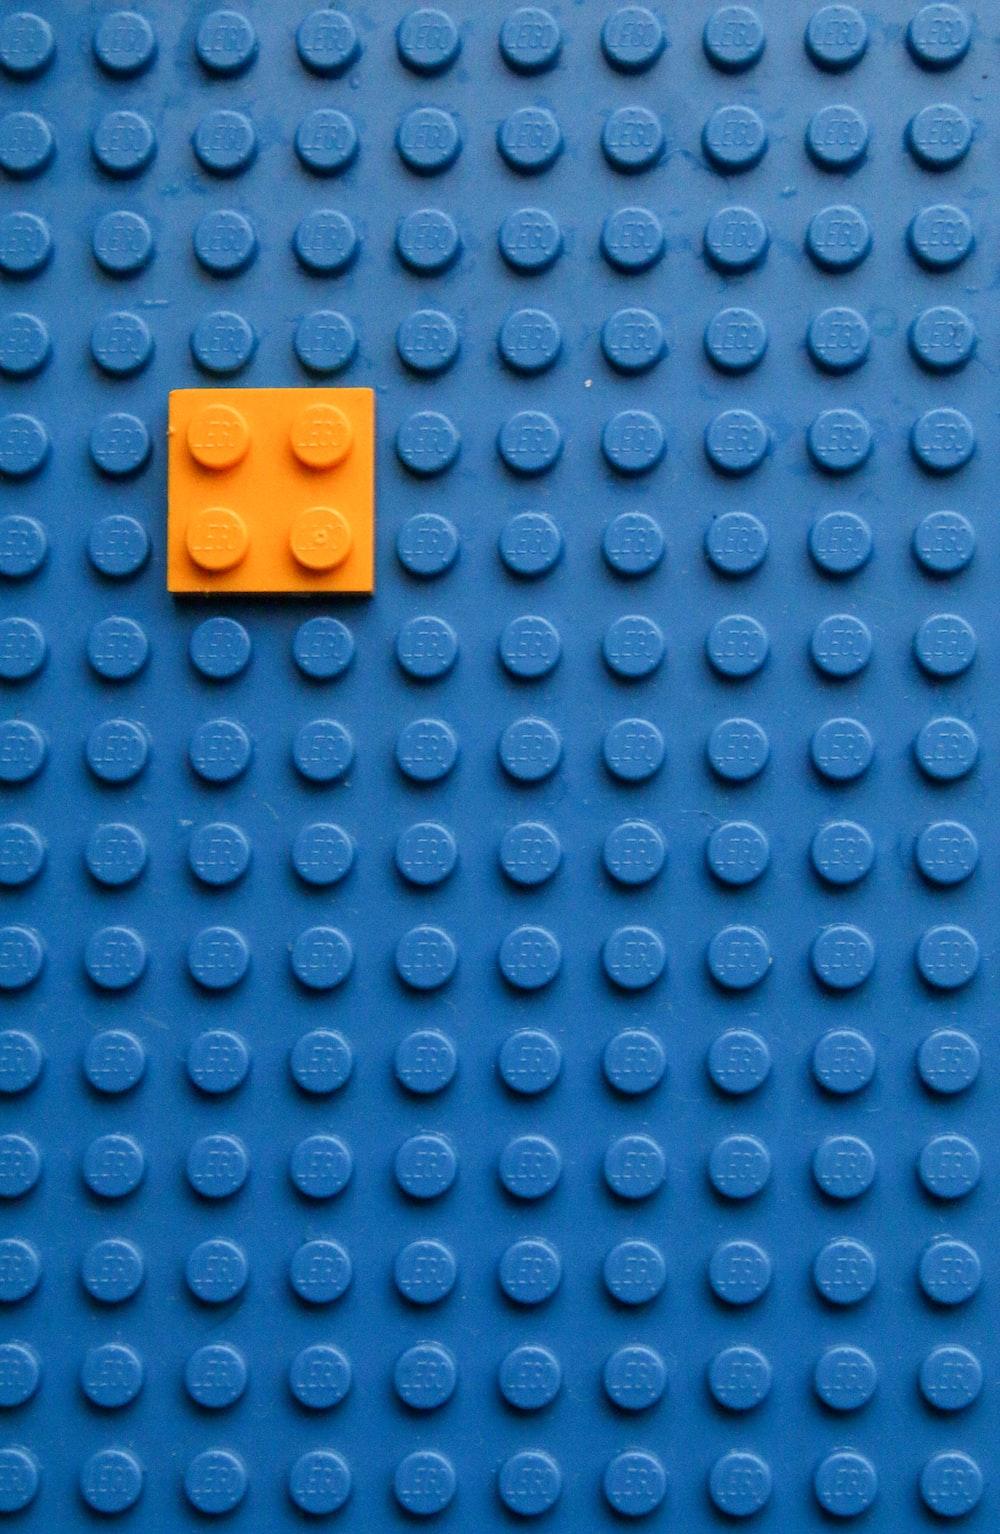 orange square on blue surface